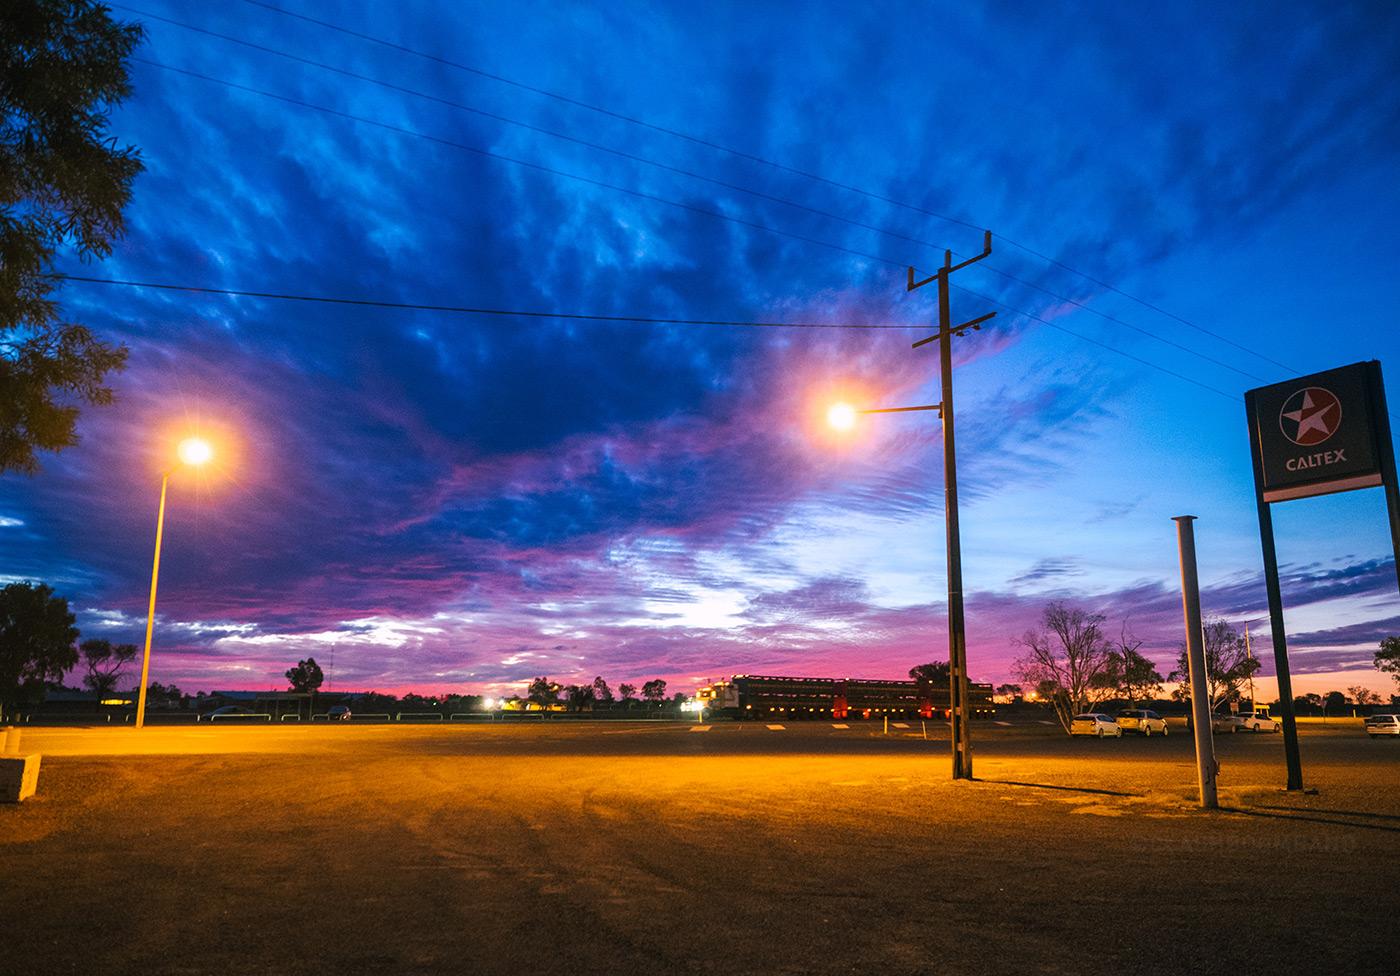 NT Australia - Ti Tree Roadhouse - Colorful sunset